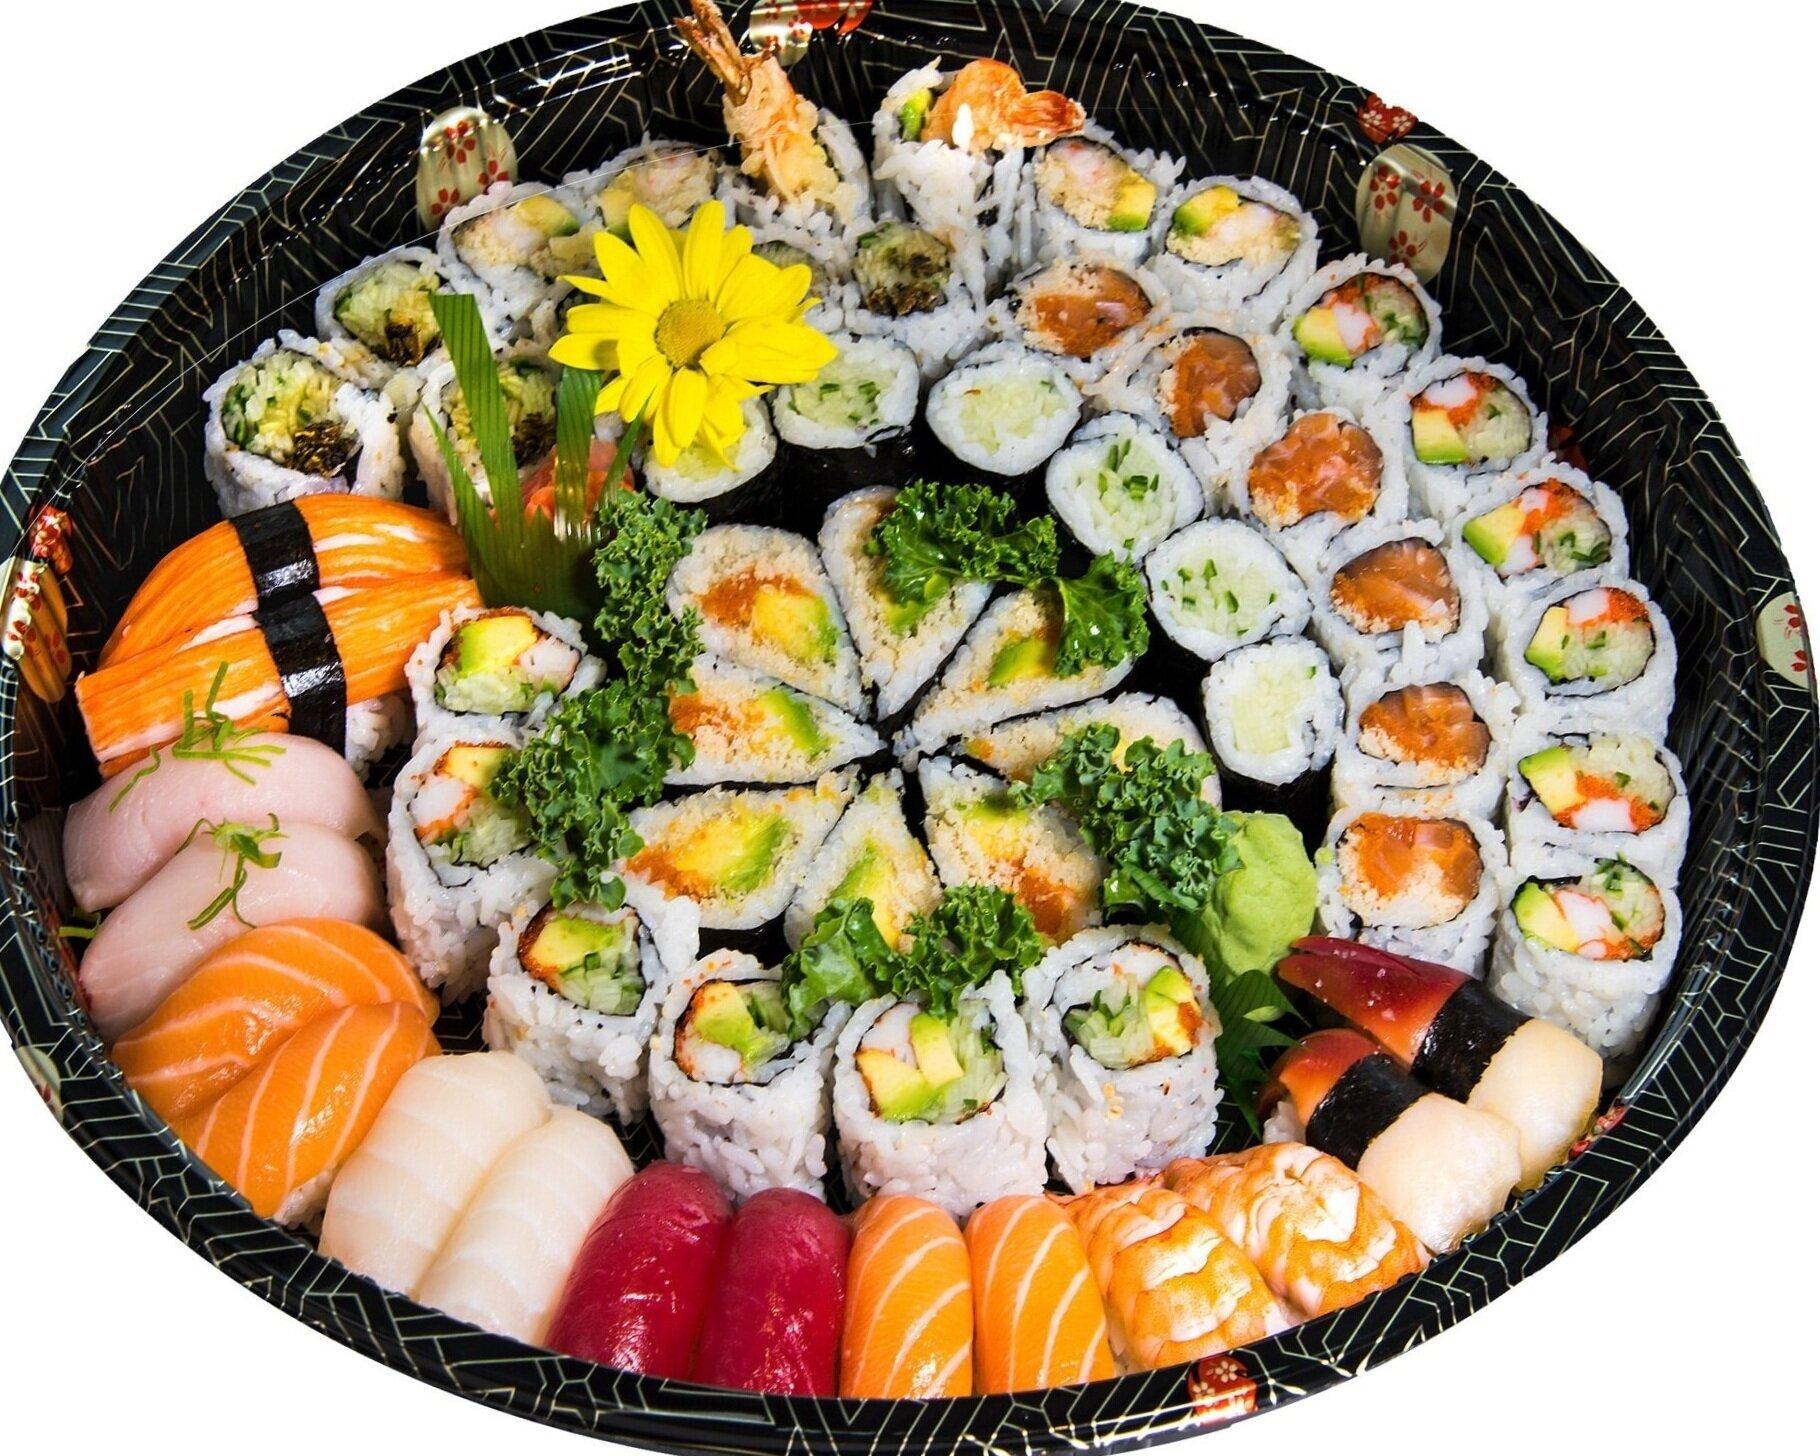 Party Tray A1 Sushi + Rolls    Sushi (16) Kamikazie (8)    Dynamite (6) Spicy Salmon (6)    California (12) Salmon Skin (6)    Cucumber (6)